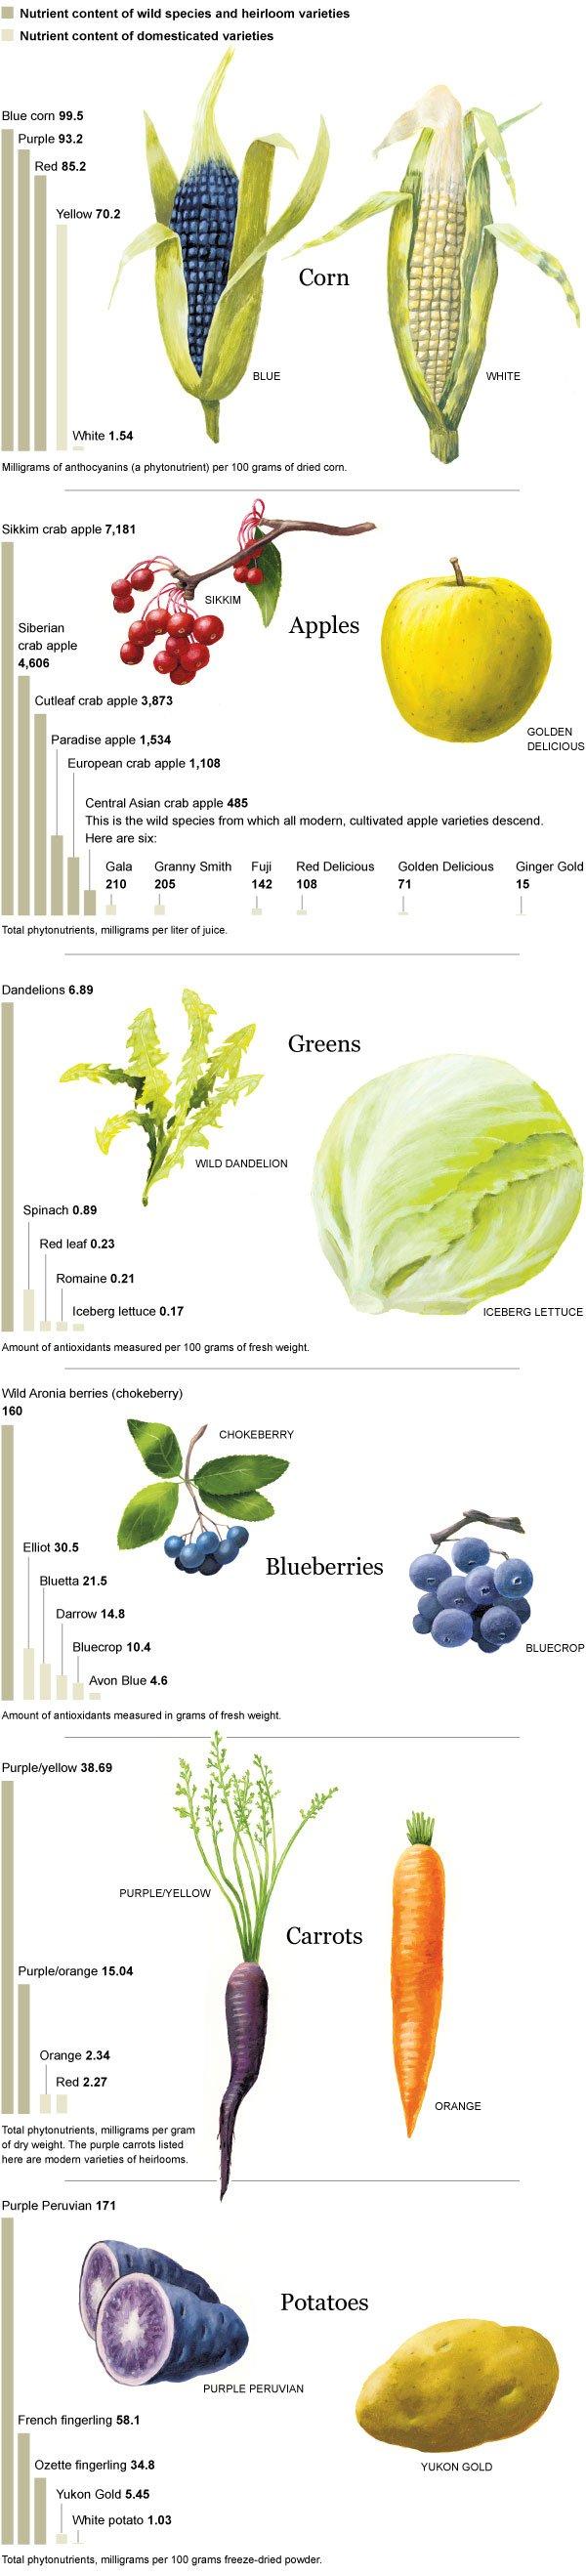 nutrition analysis.jpg